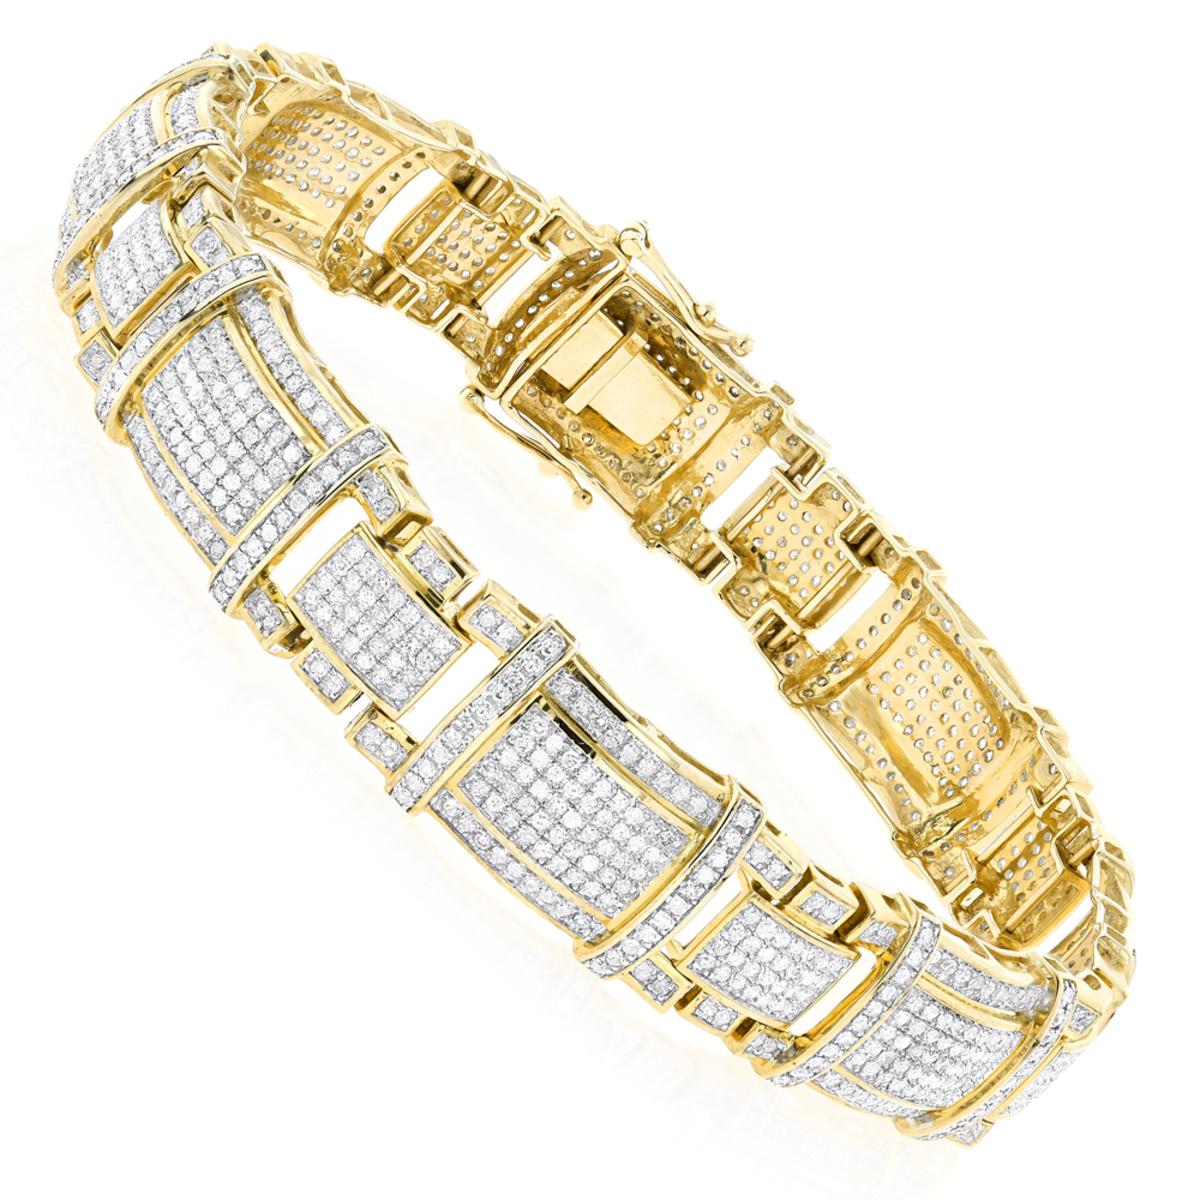 Mens Real Diamond Bracelet 10K Gold 4ct